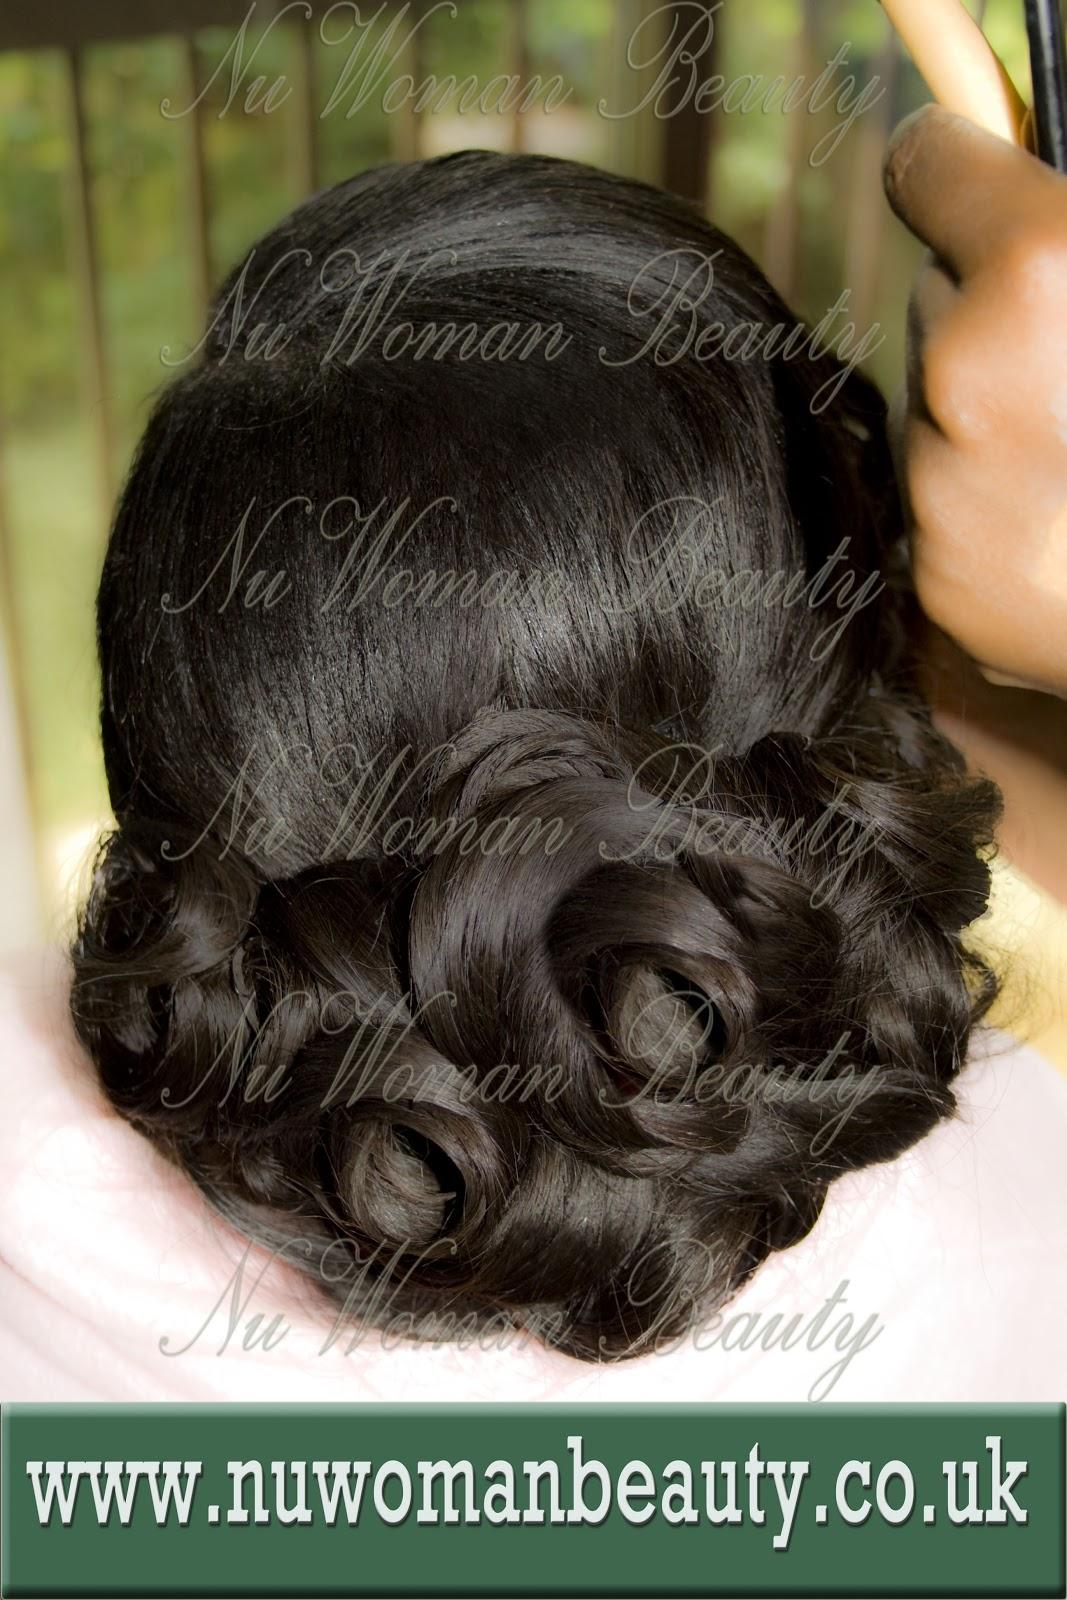 http://4.bp.blogspot.com/-MYpDJmXLf4Y/UIiYVtT1obI/AAAAAAAAAaI/wVZEutWpCwc/s1600/Bridal+hair+333.jpg